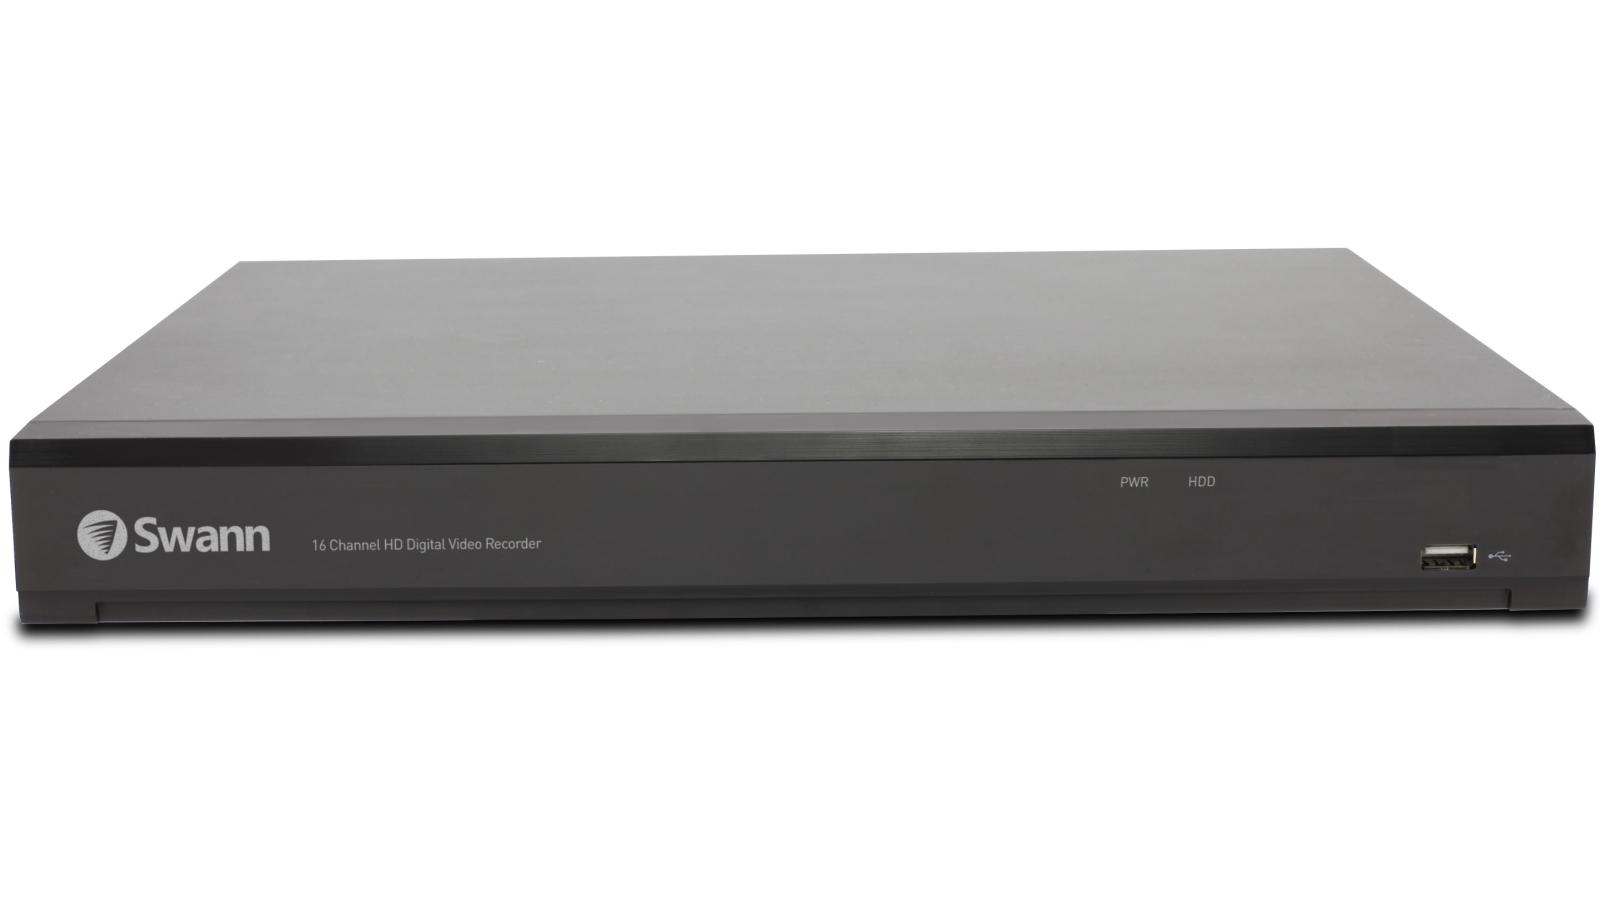 Swann DVR-5580 16 Channel 4K Digital Video Recorder with 8 4K Thermal  Sensing Camera